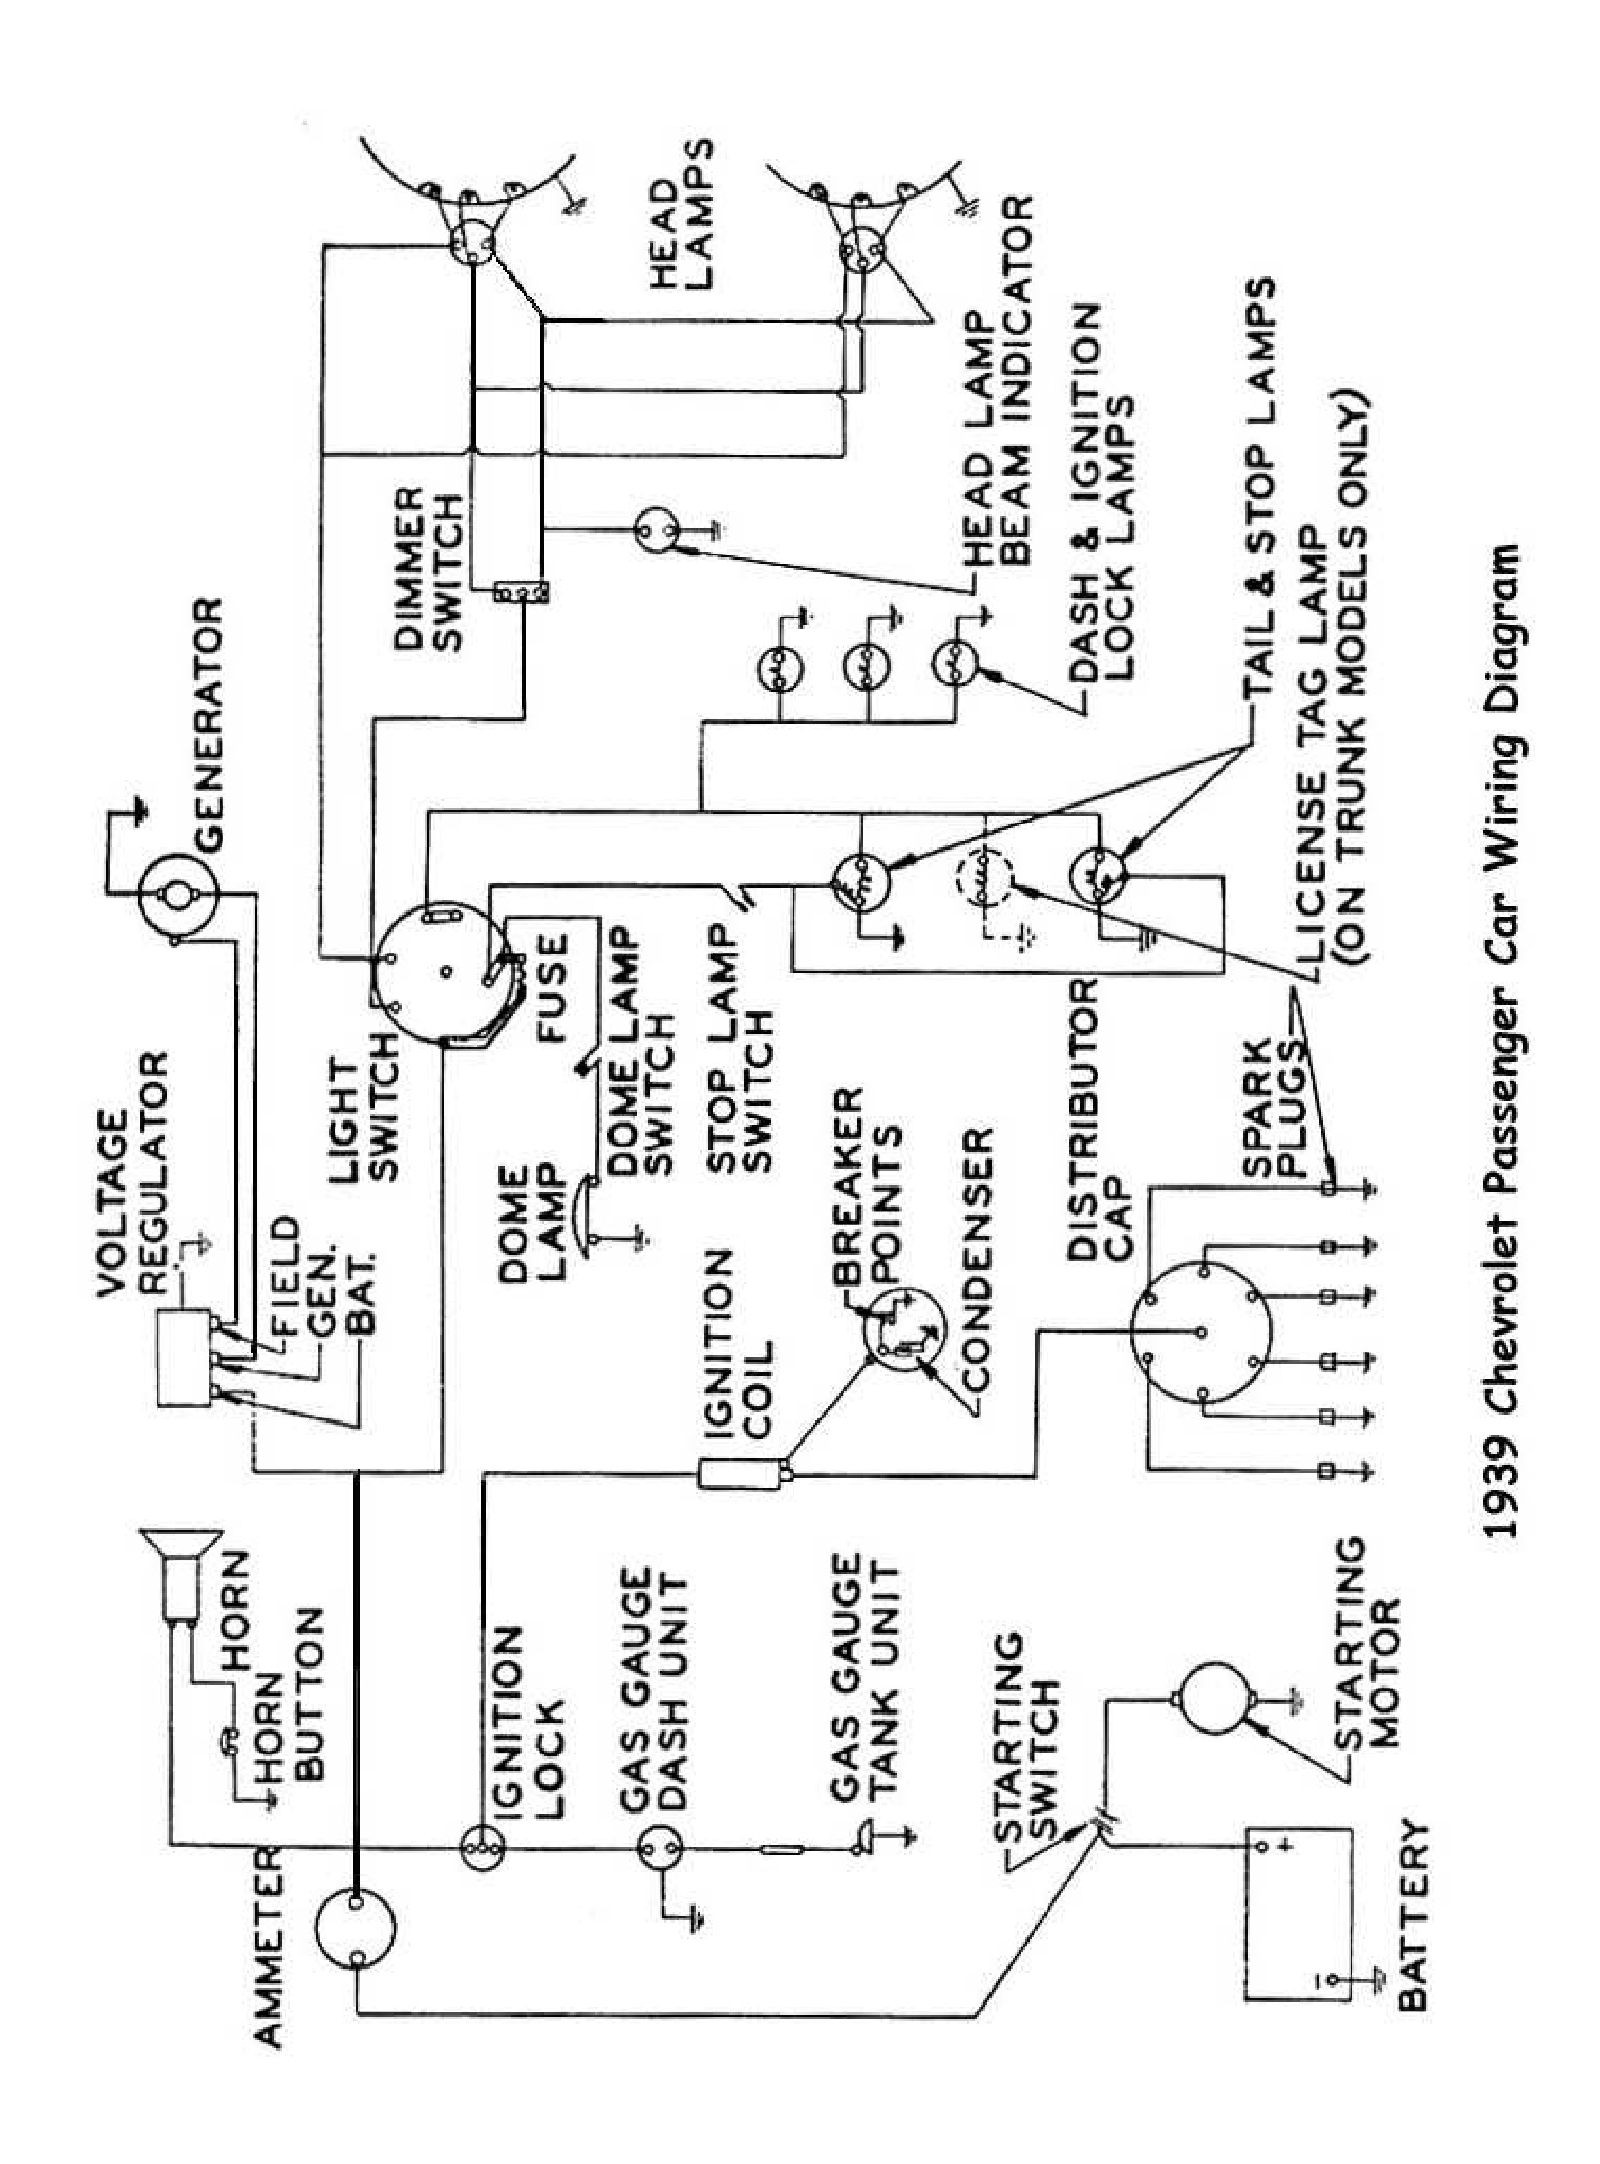 hight resolution of 65 chevy alternator wiring diagram wiring library wiring diagram ford alternator 2004 gto also 2001 dodge caravan 3 3